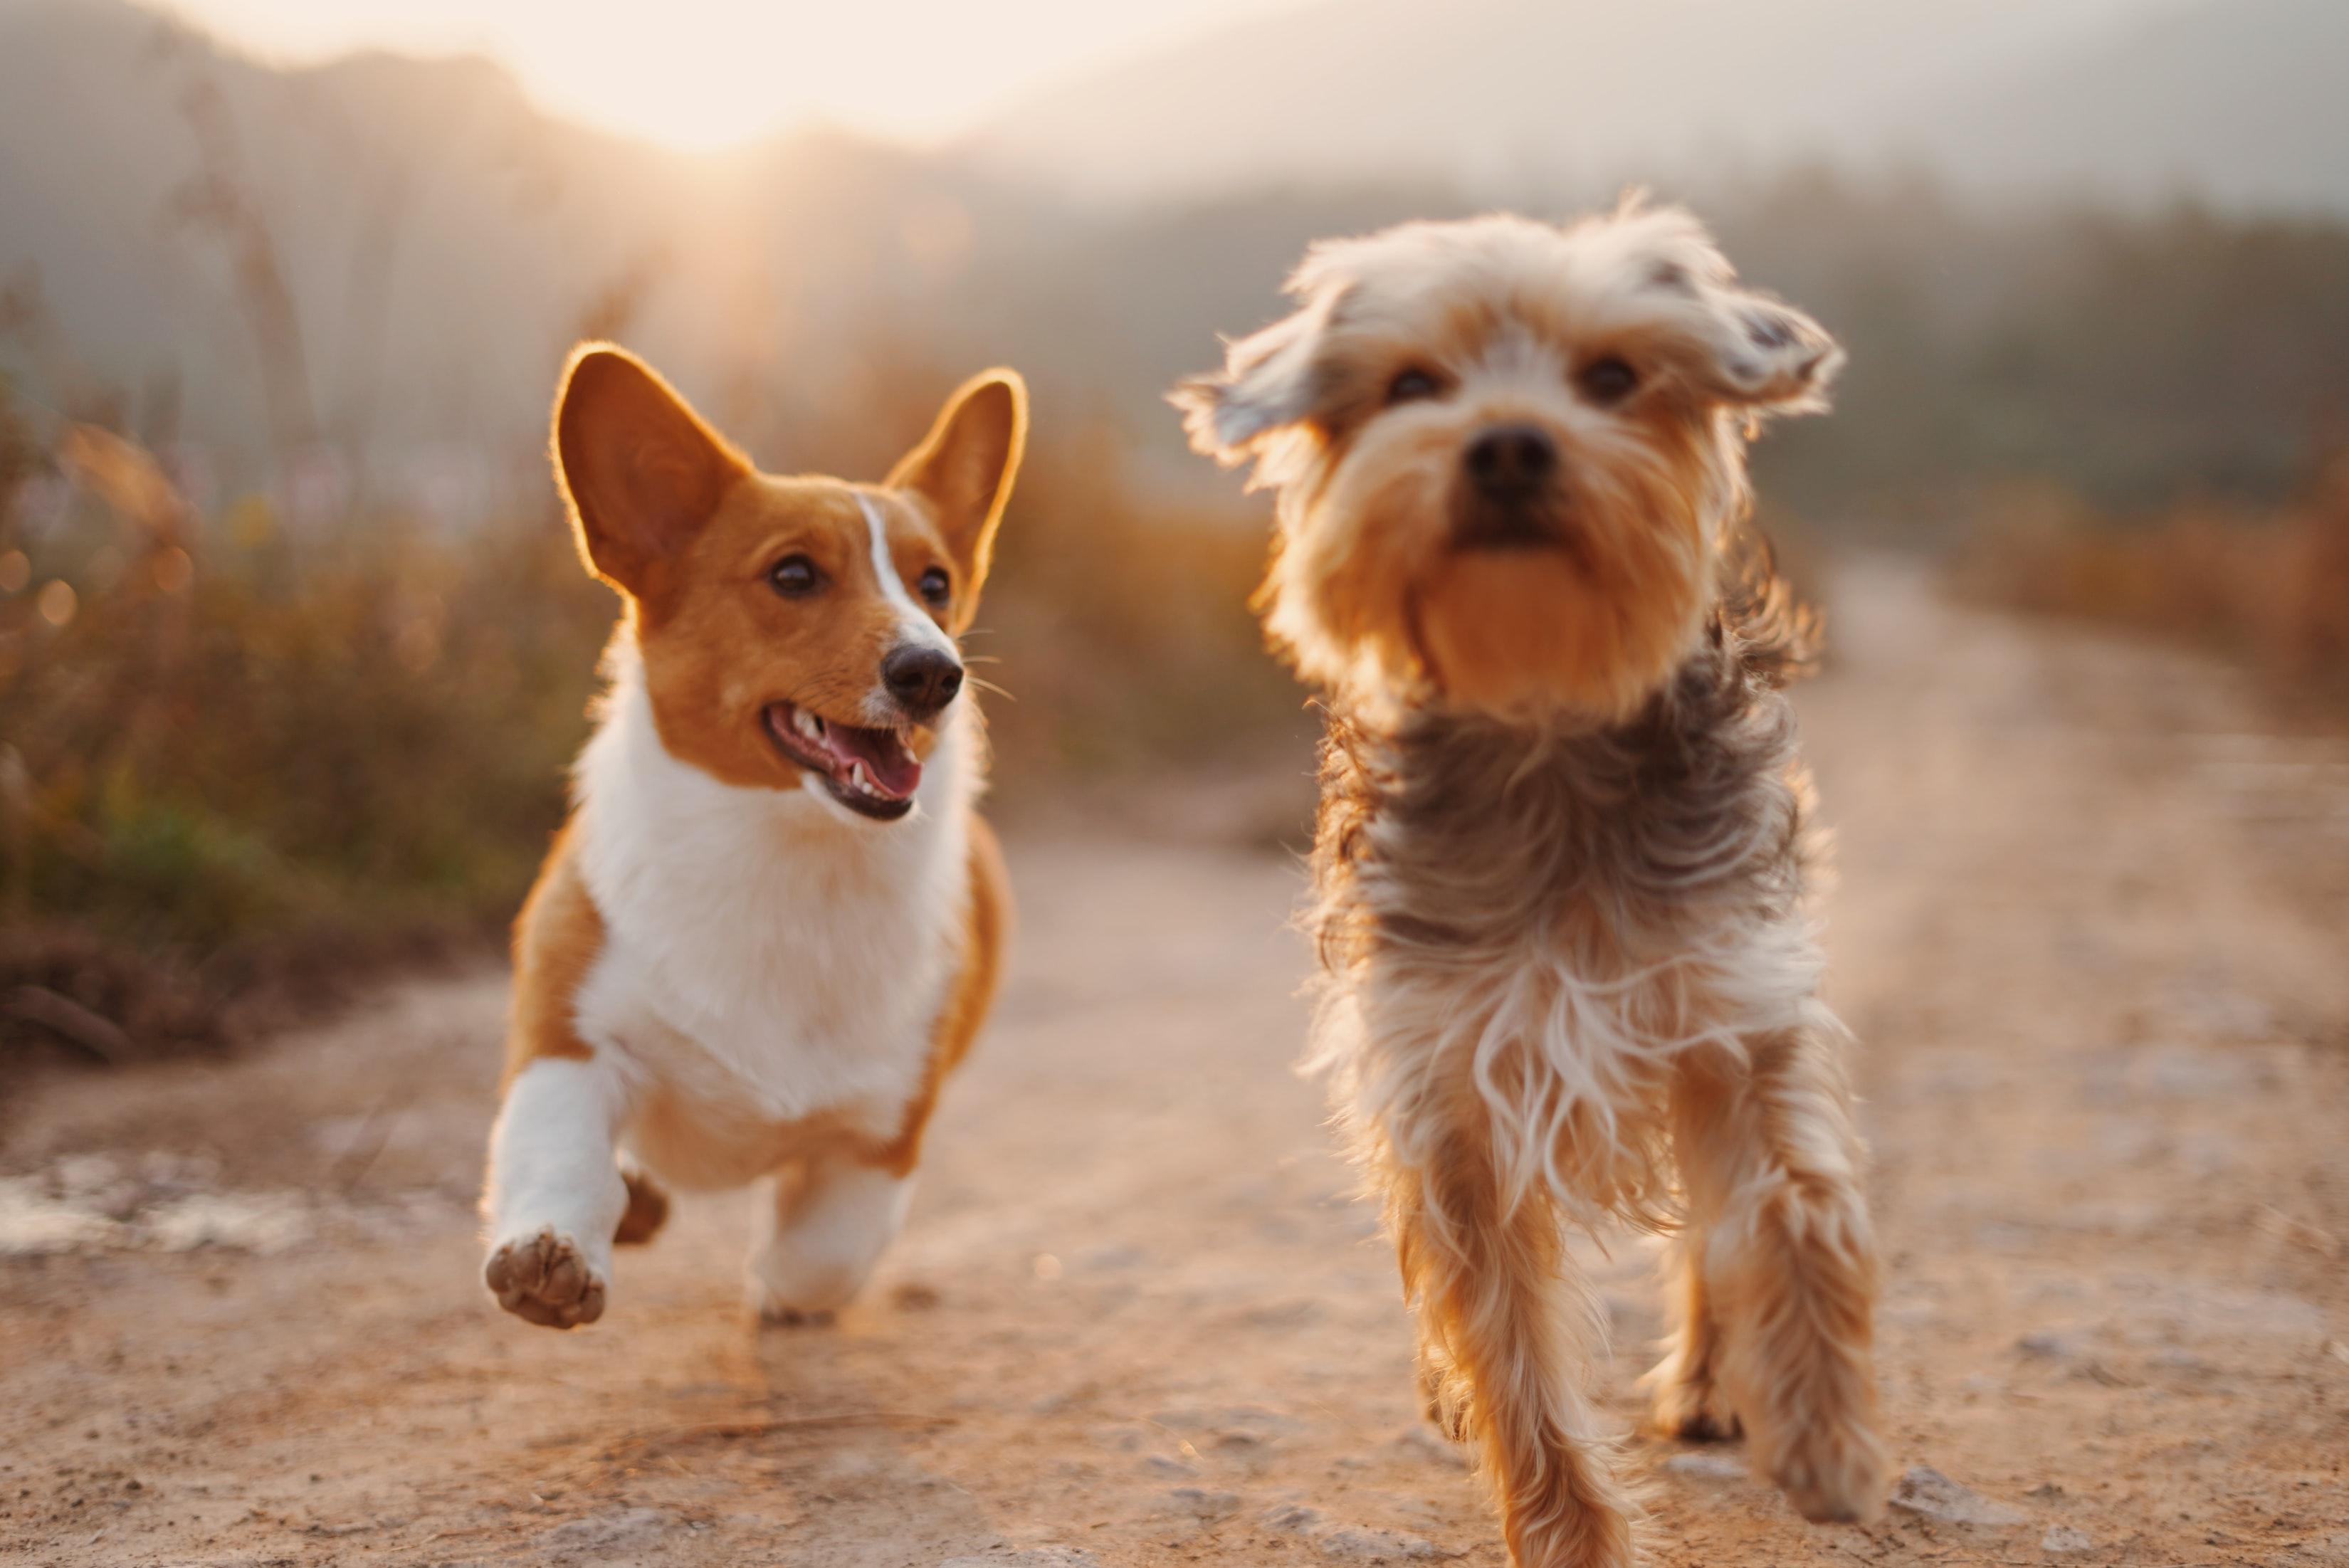 Cute Puppies Running